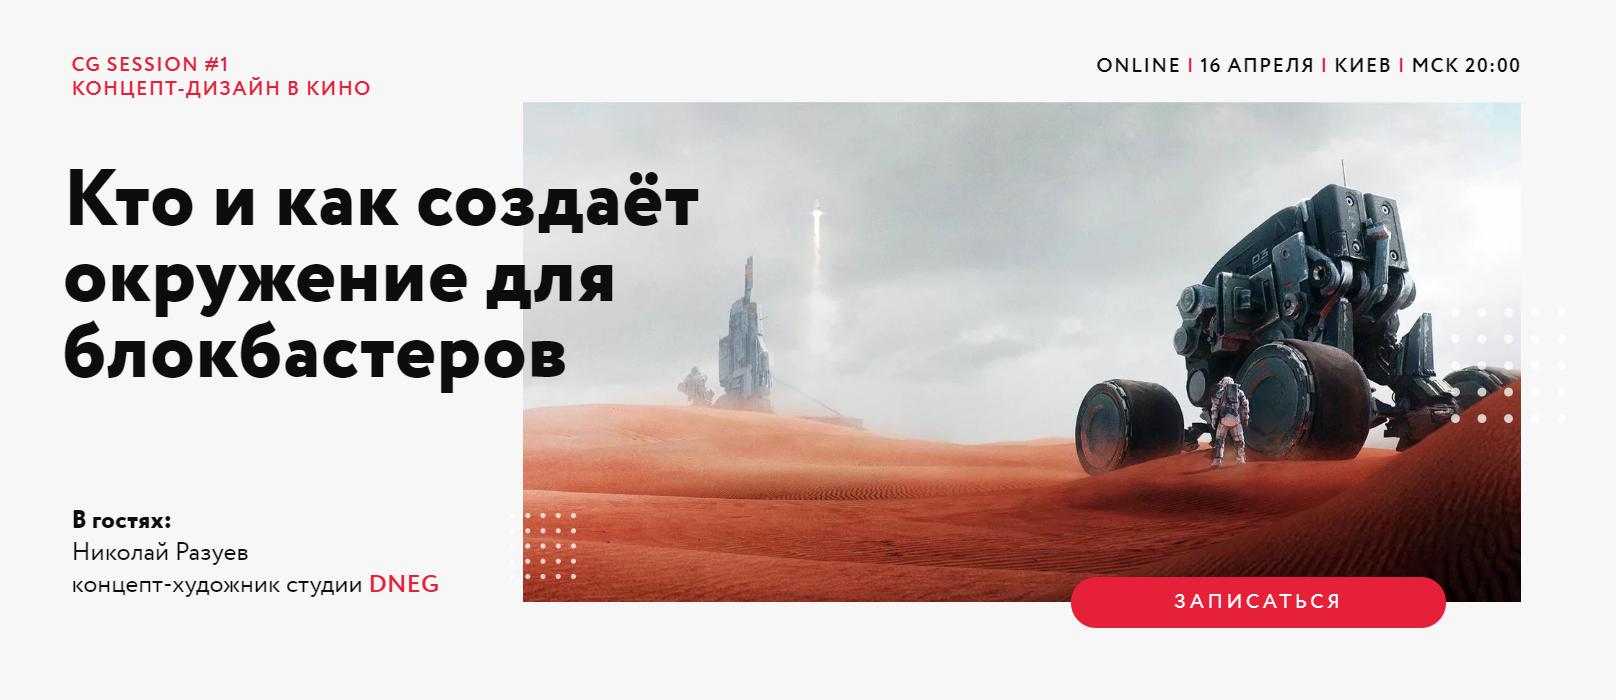 Онлайн-встреча Концепт-дизайн в кино [АrtСrаft] [Николай Разуев ...